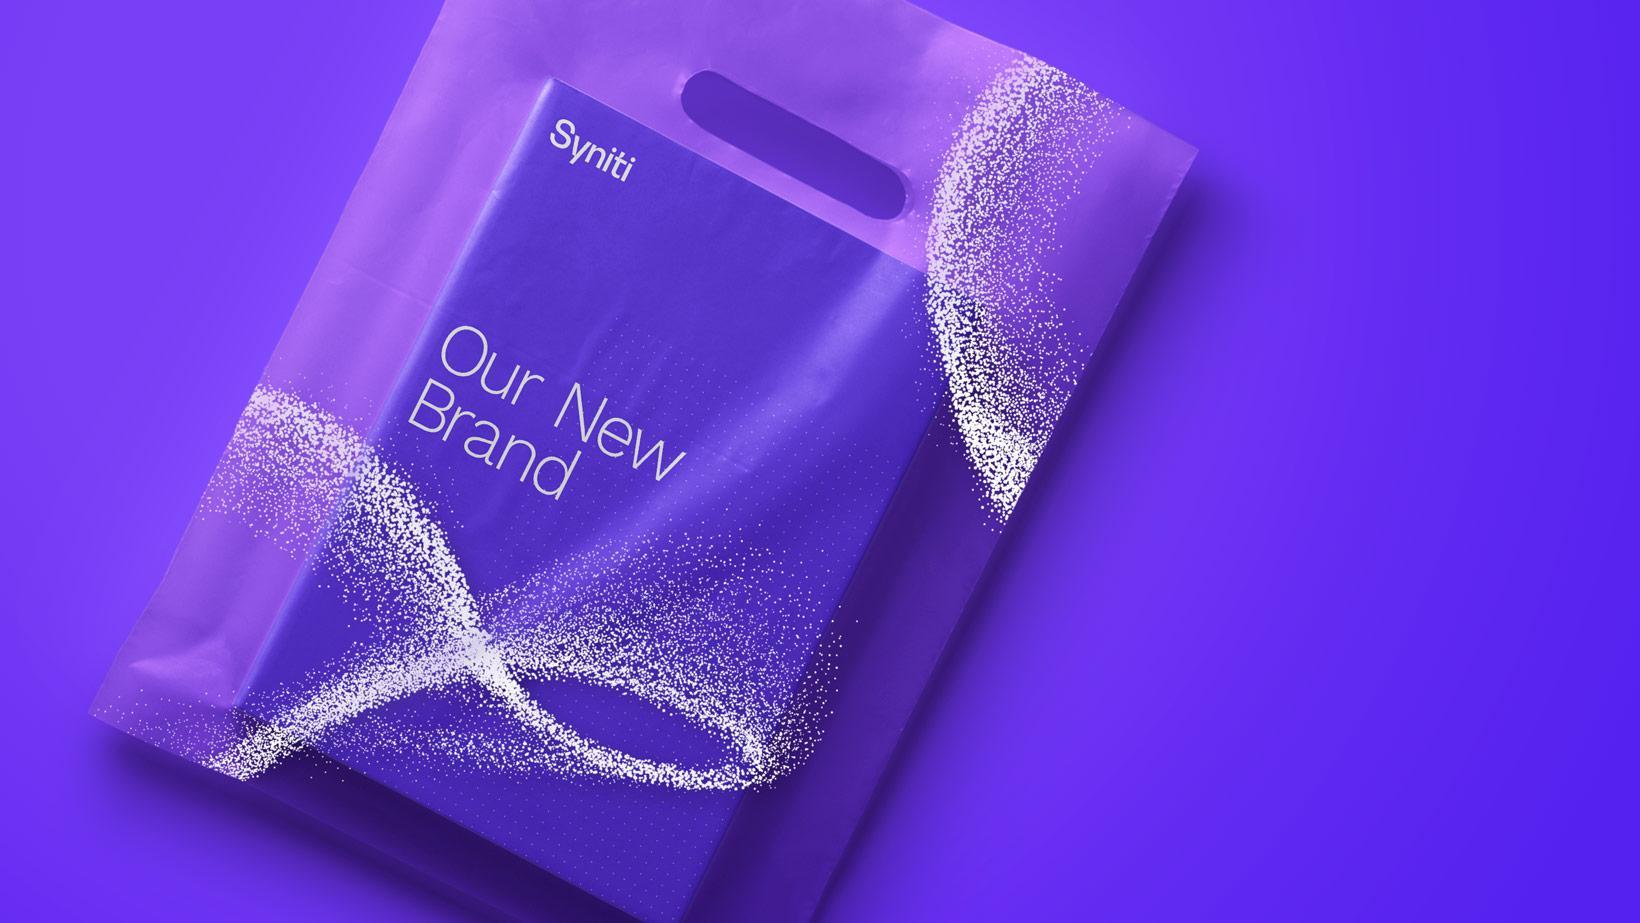 Confederation-Studio-Syniti-Branding-Bag-1.jpg